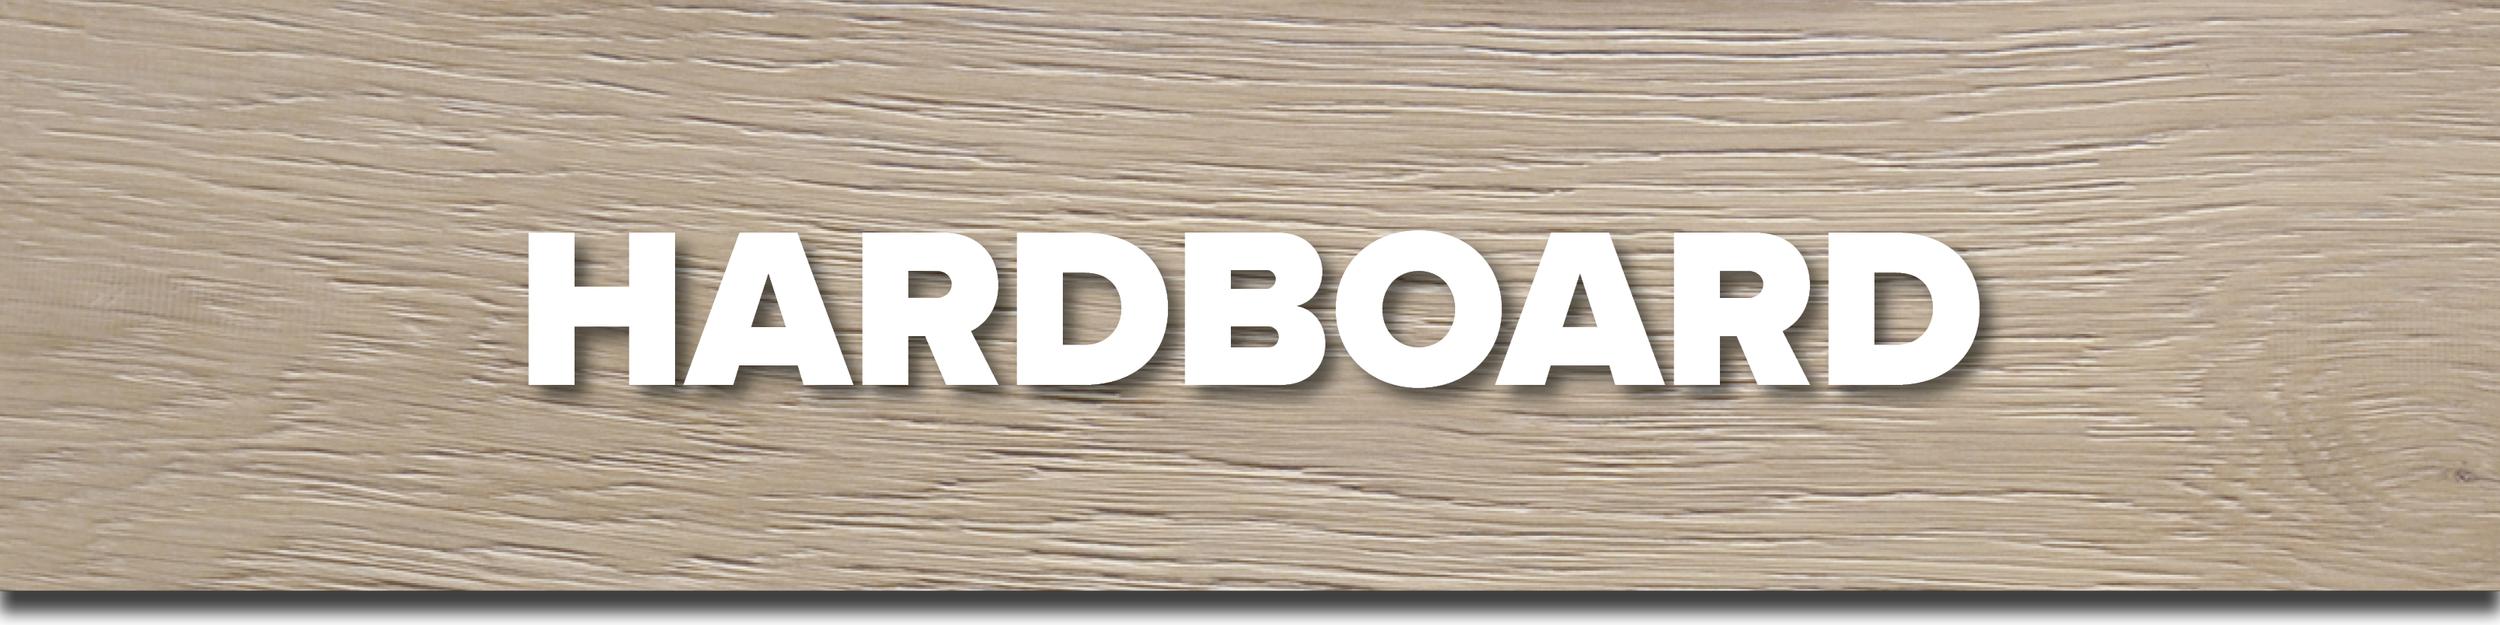 Hardboard.png